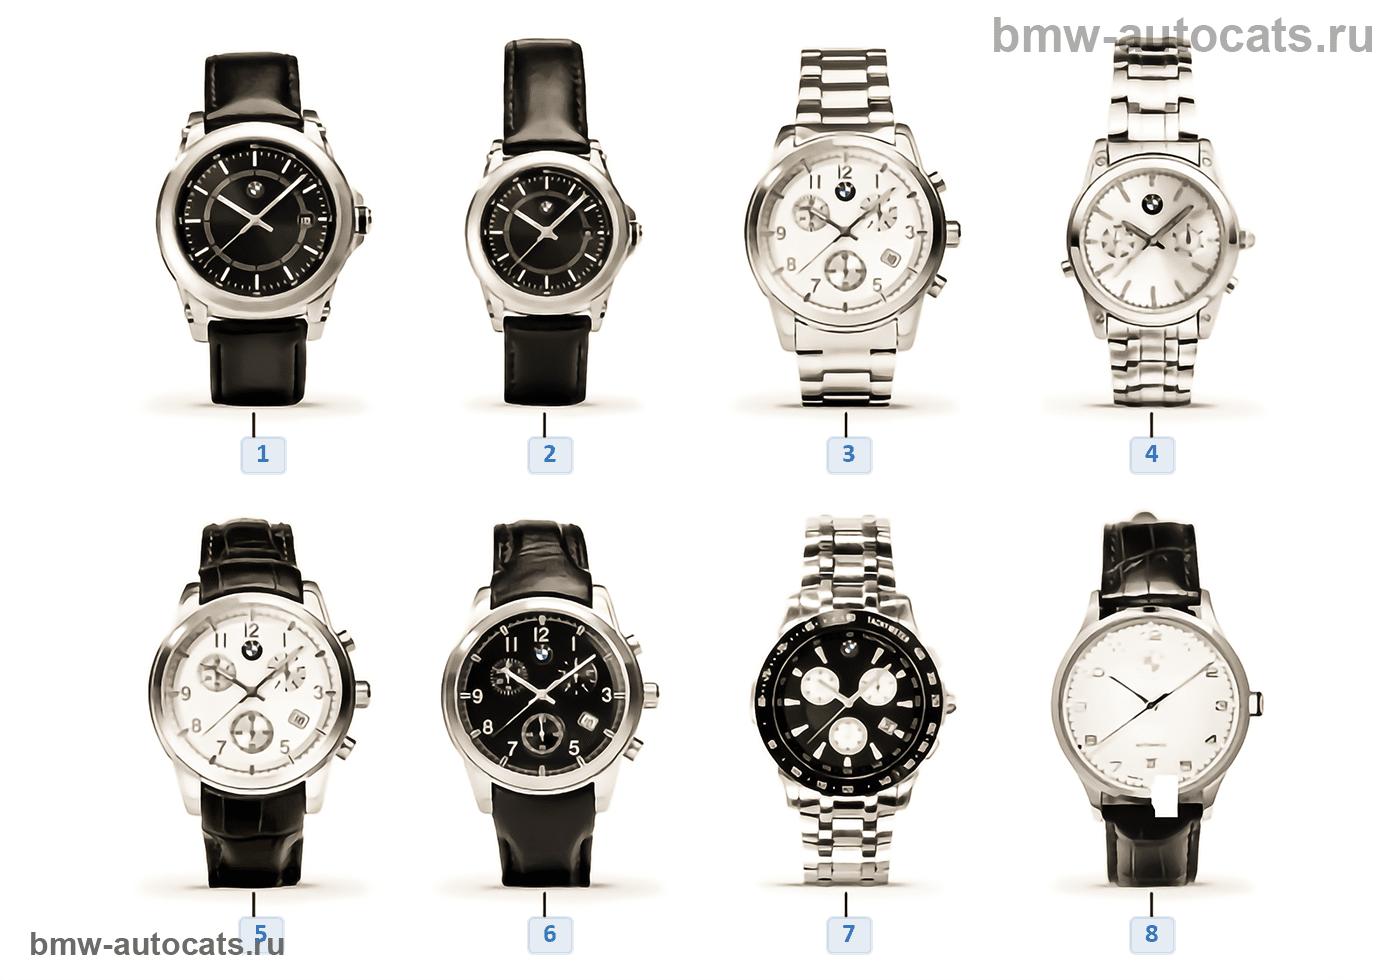 Запасные части BMW — часы 2011/2012